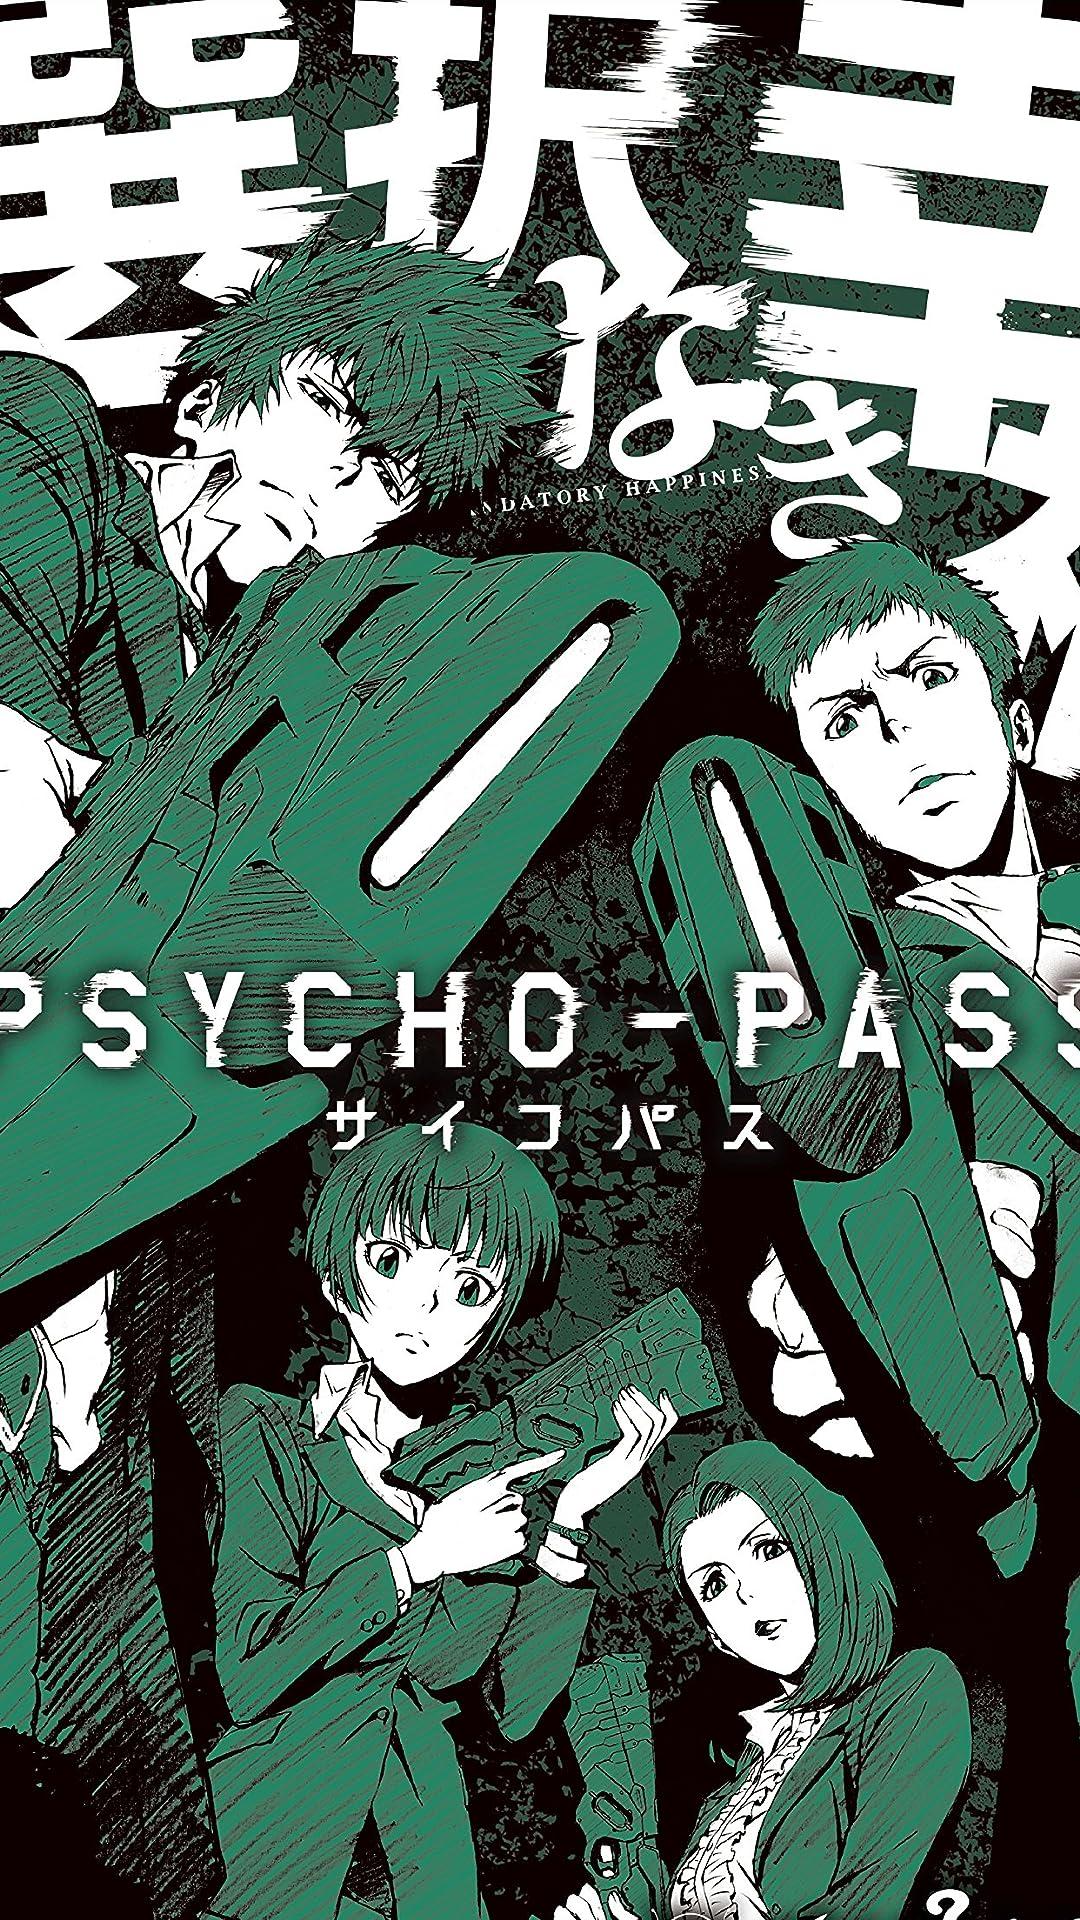 Psycho Passサイコパス 選択なき幸福 常守朱 狡噛慎也 誓湯撫子 剱